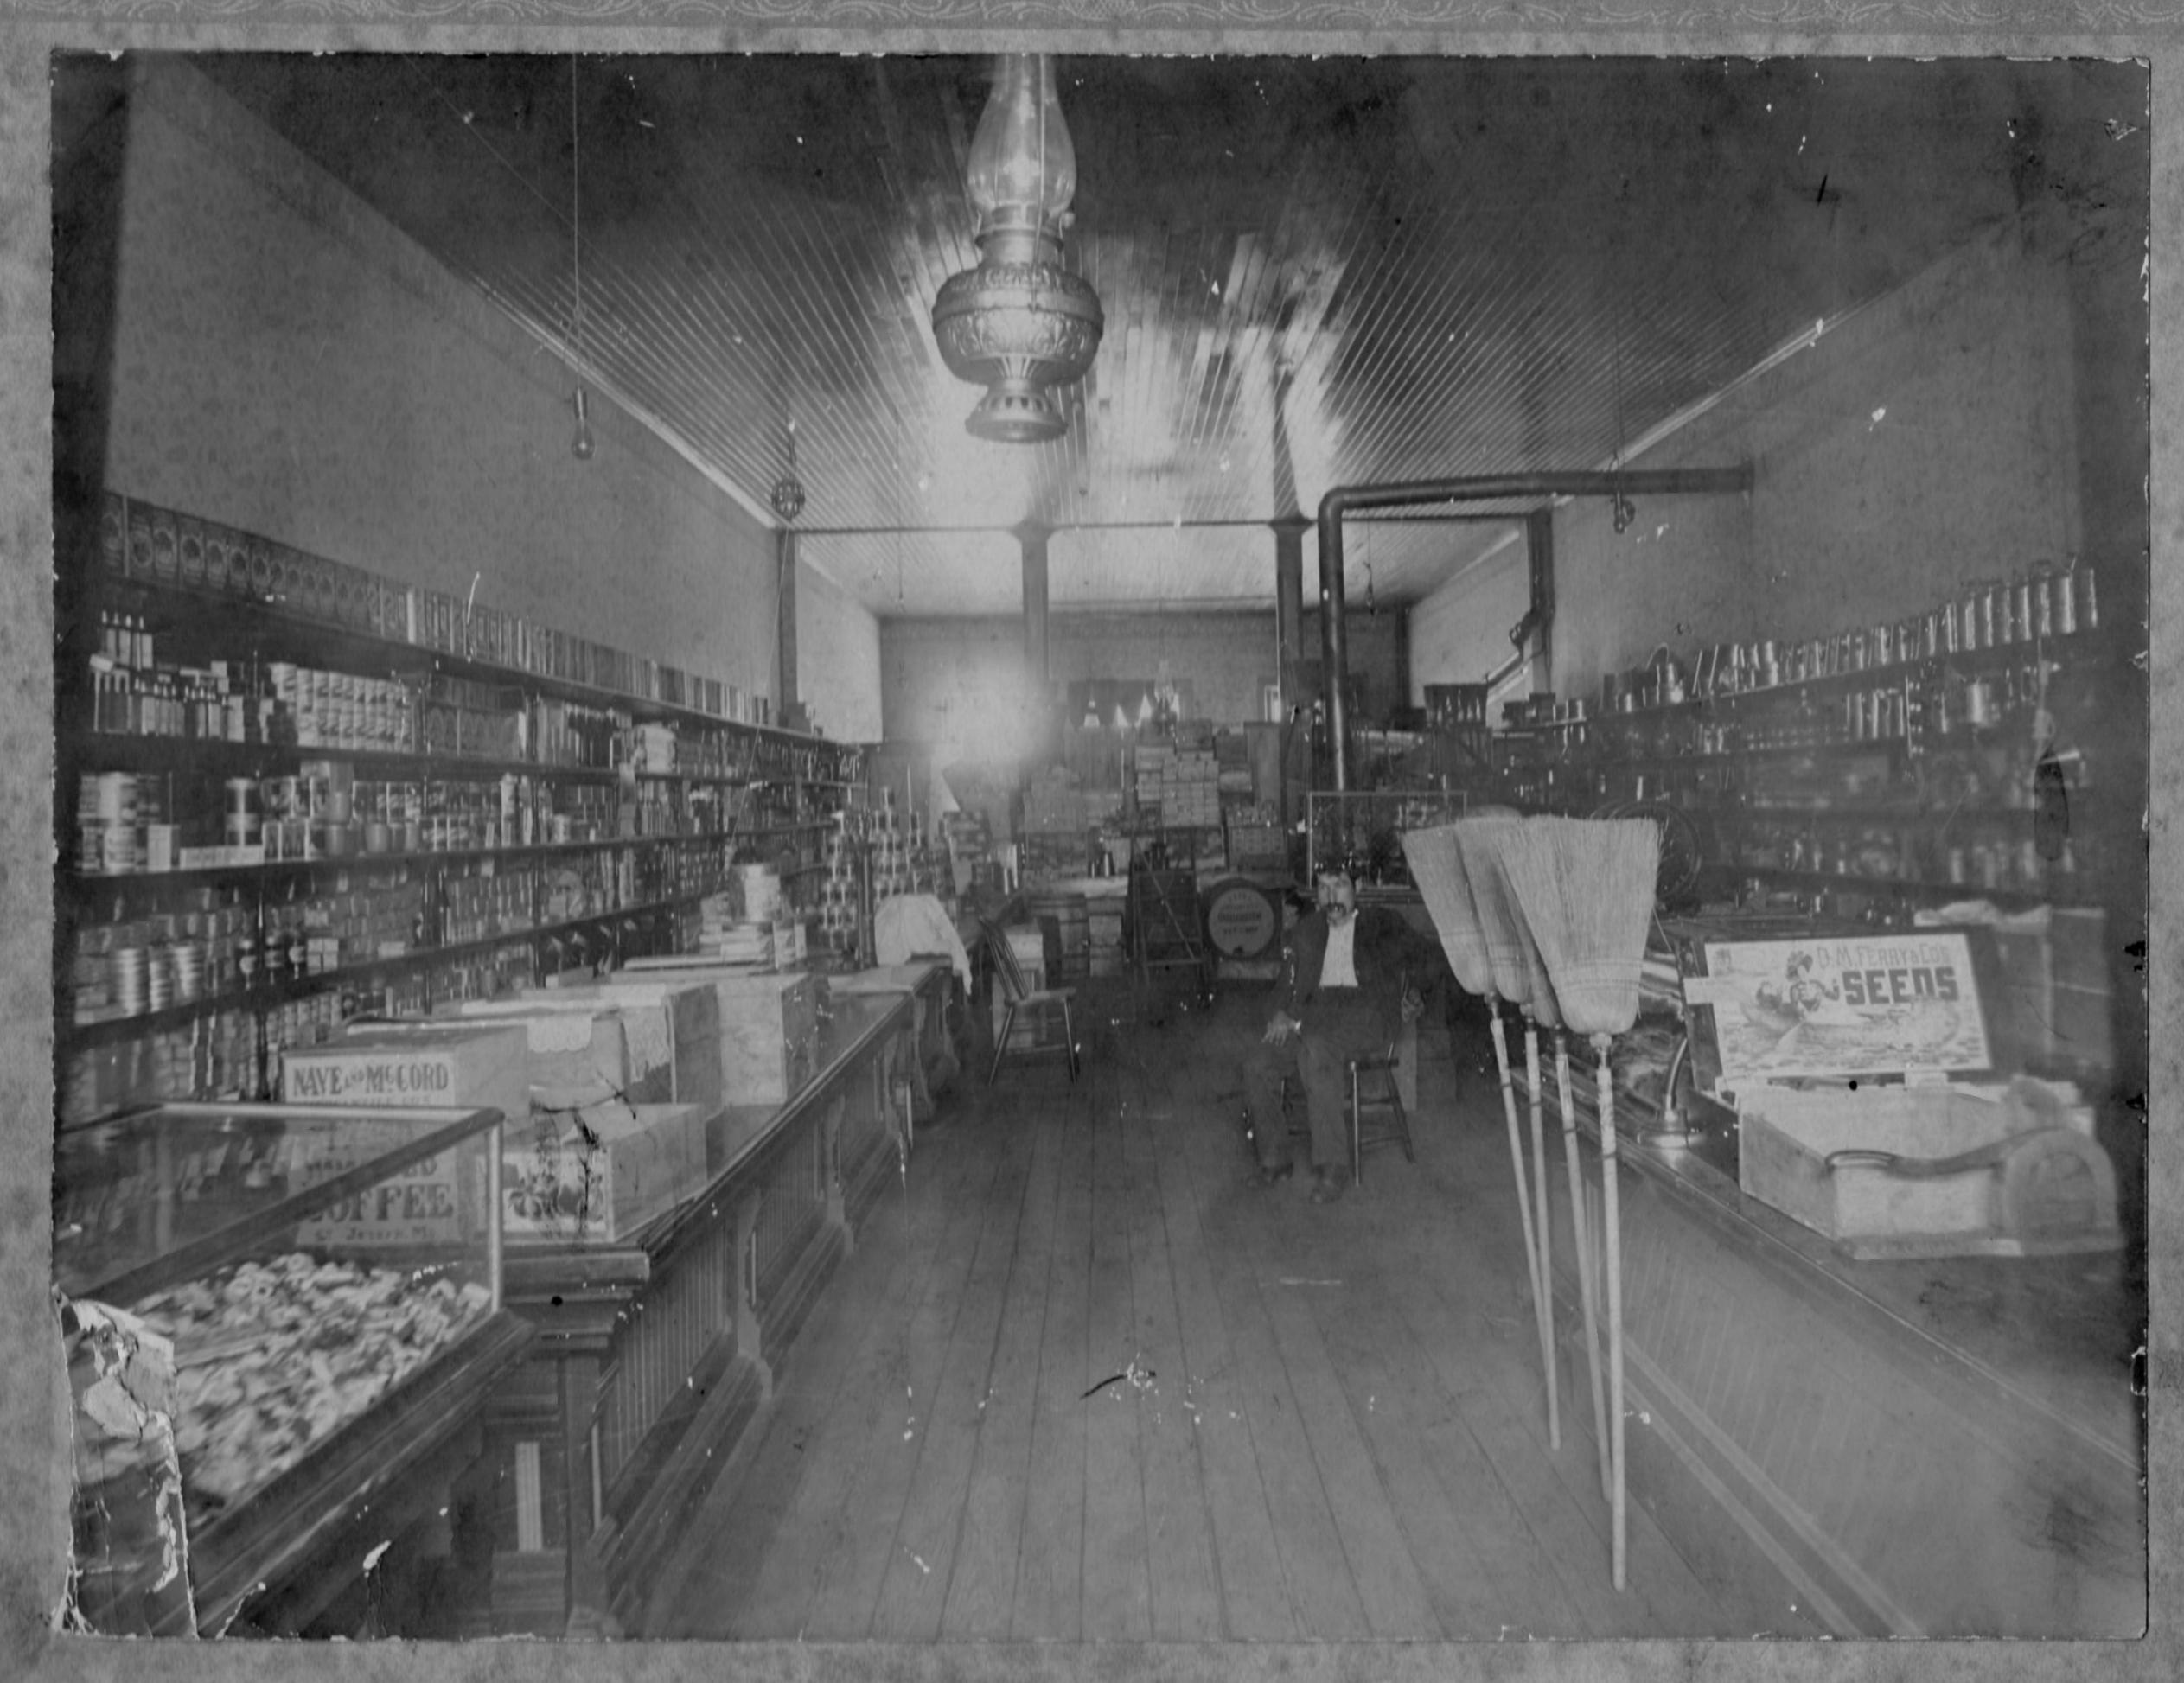 Frank Crofskey in his San Francisco shop circa 1900.